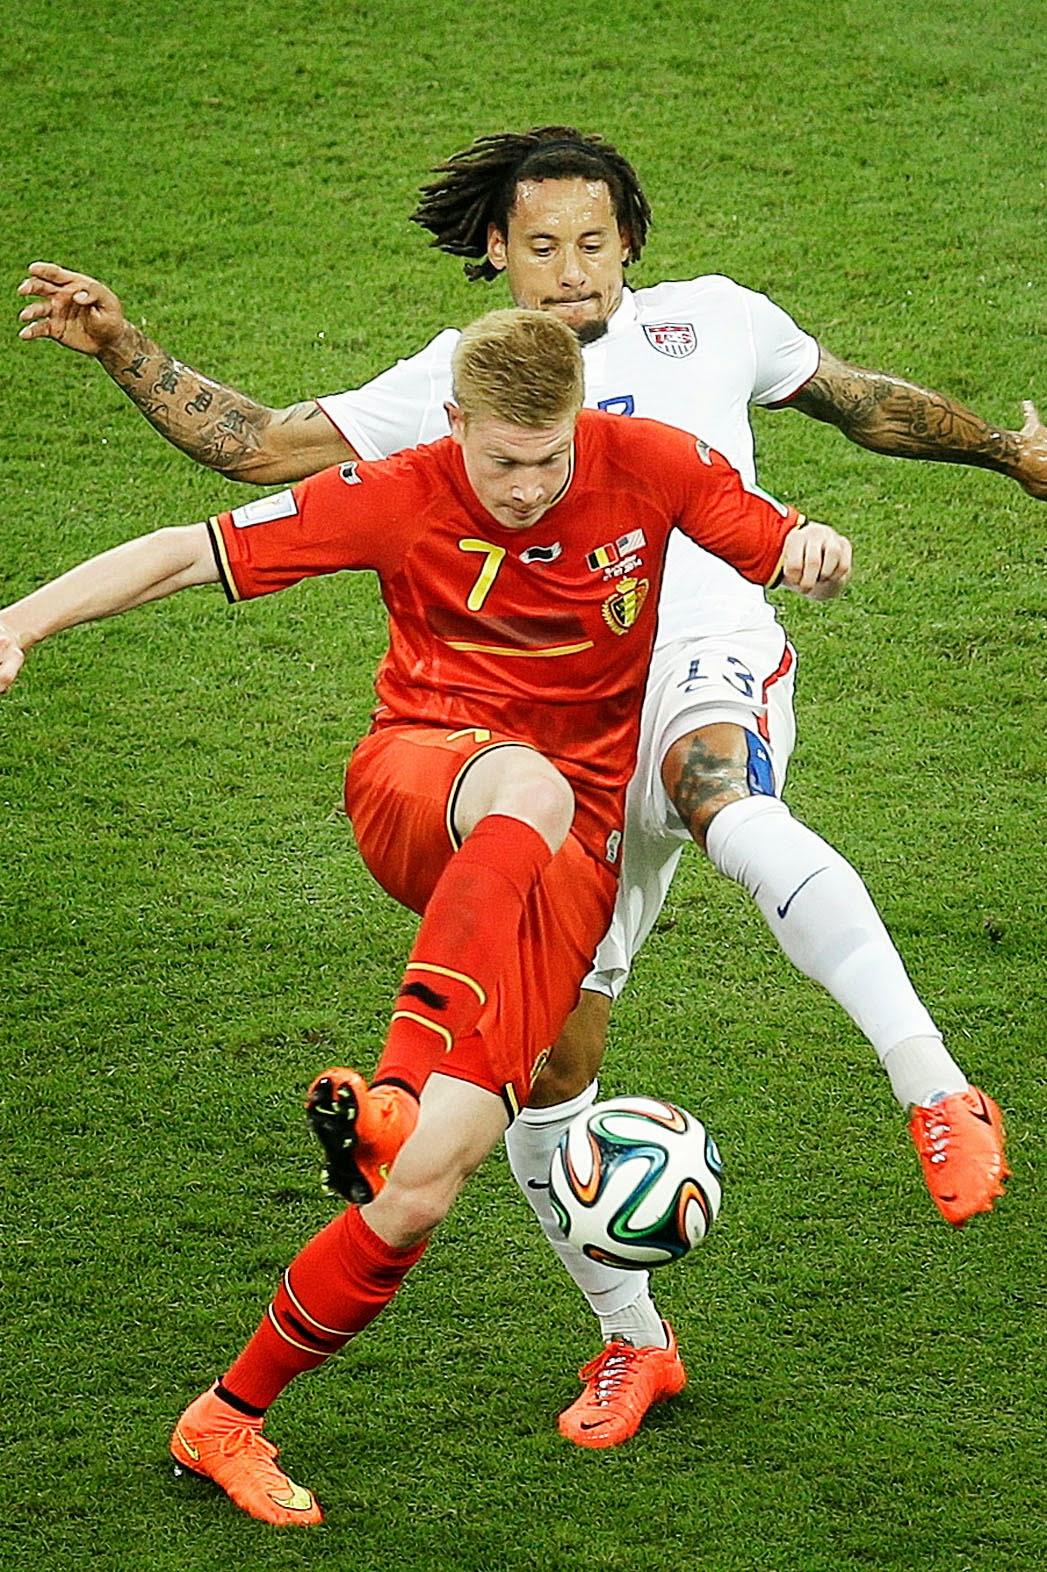 Belgia vs Ameria Serikat